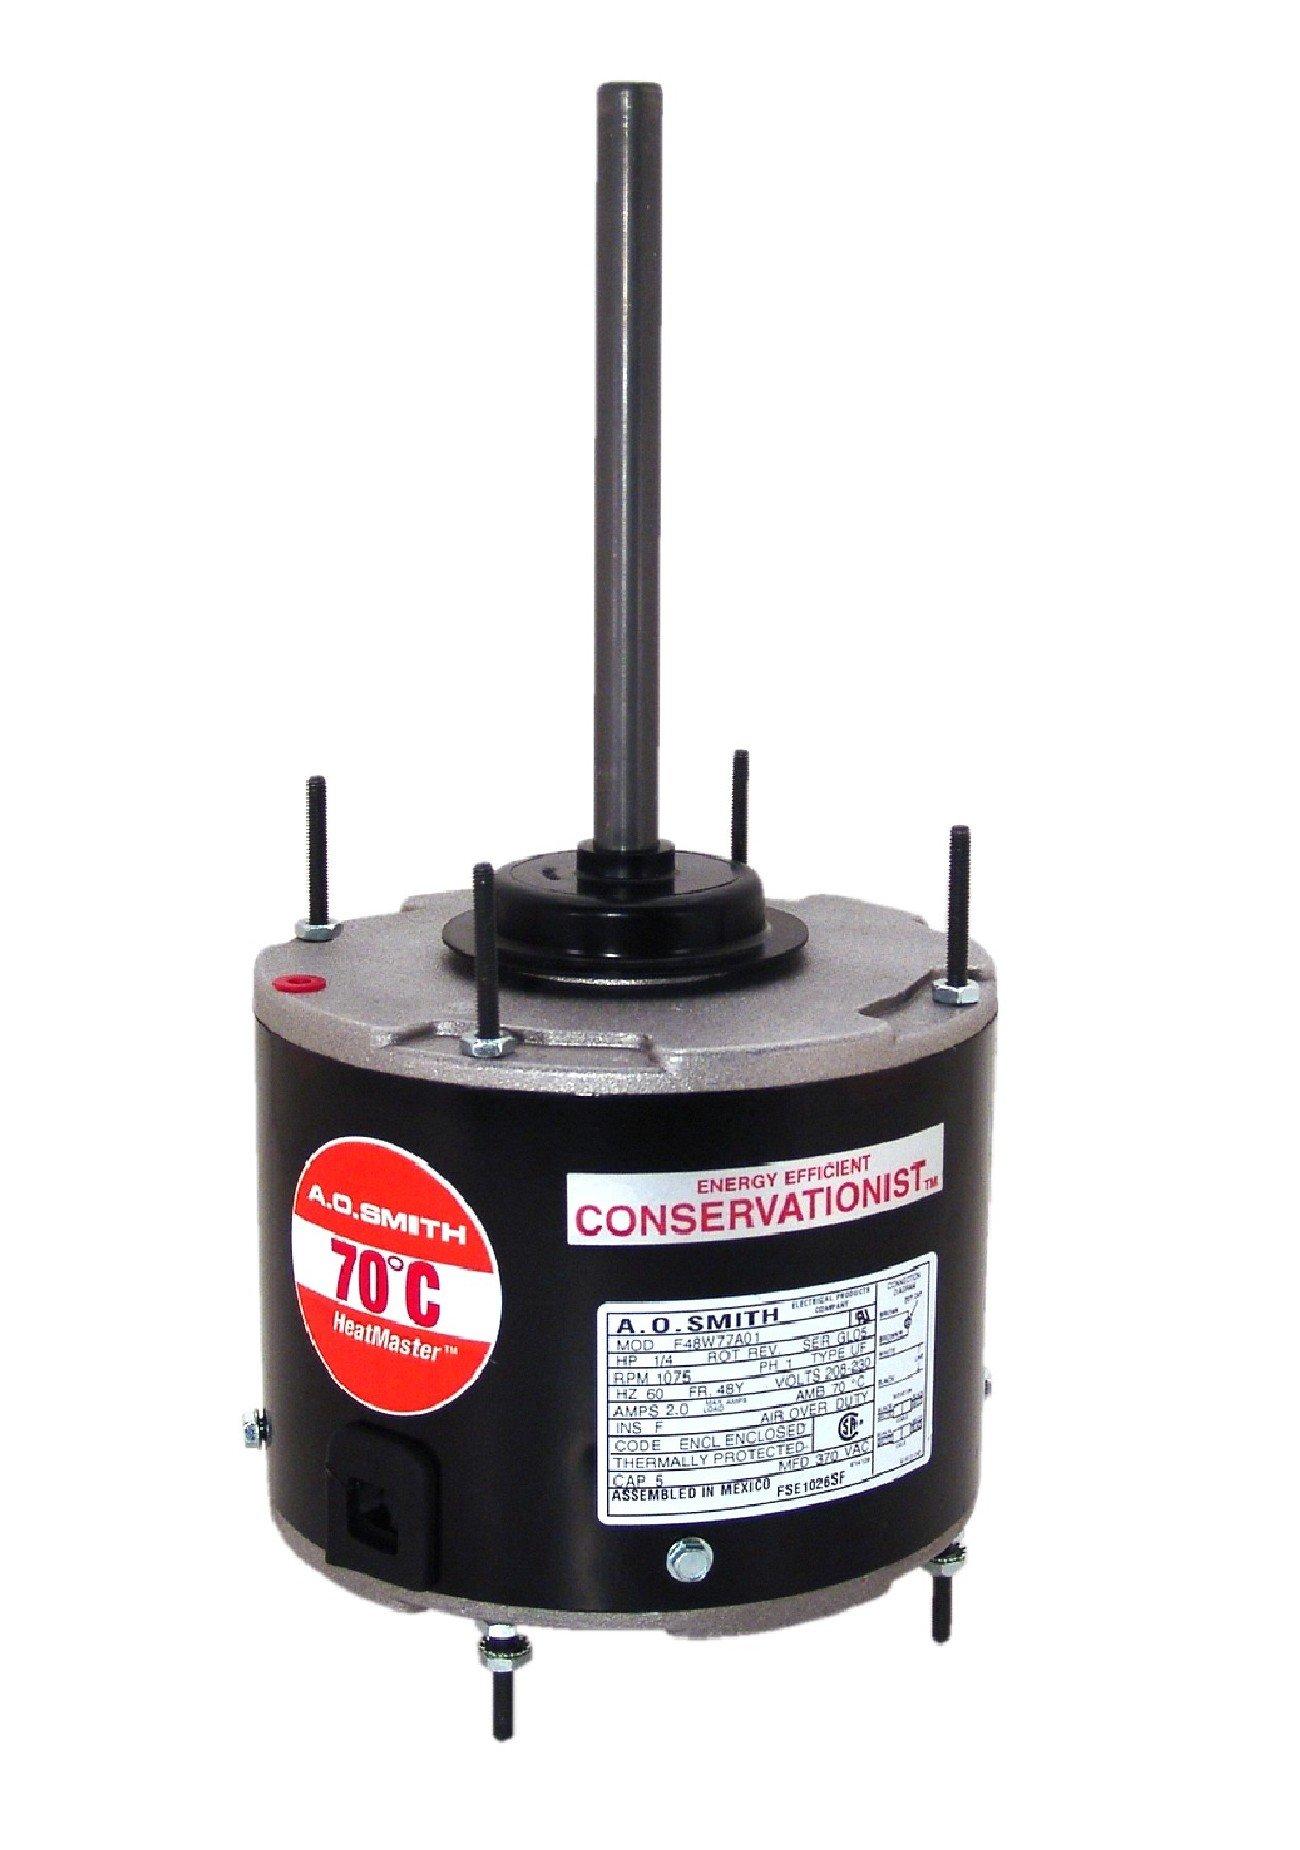 A.O. Smith FE1056SF 1/2 HP, 1075 RPM, 208-230 volts, 4 Amps, 48 Frame, Ball Bearing Condenser Motor